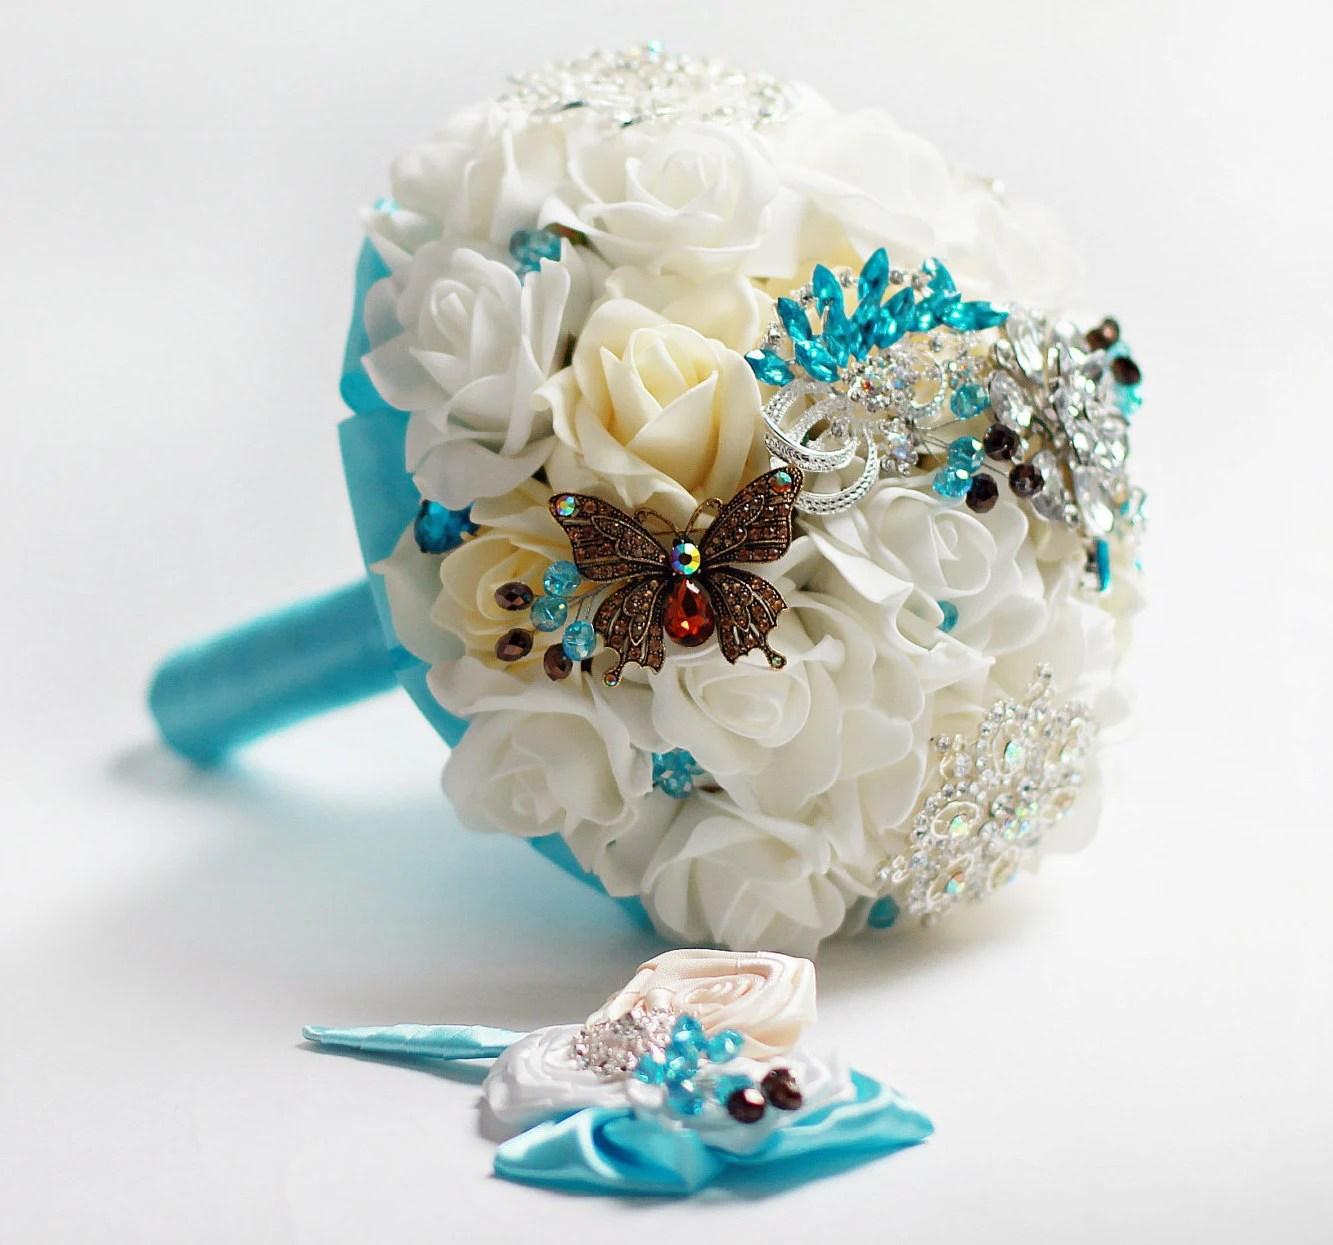 Turquoise Brooch On Wedding Dress